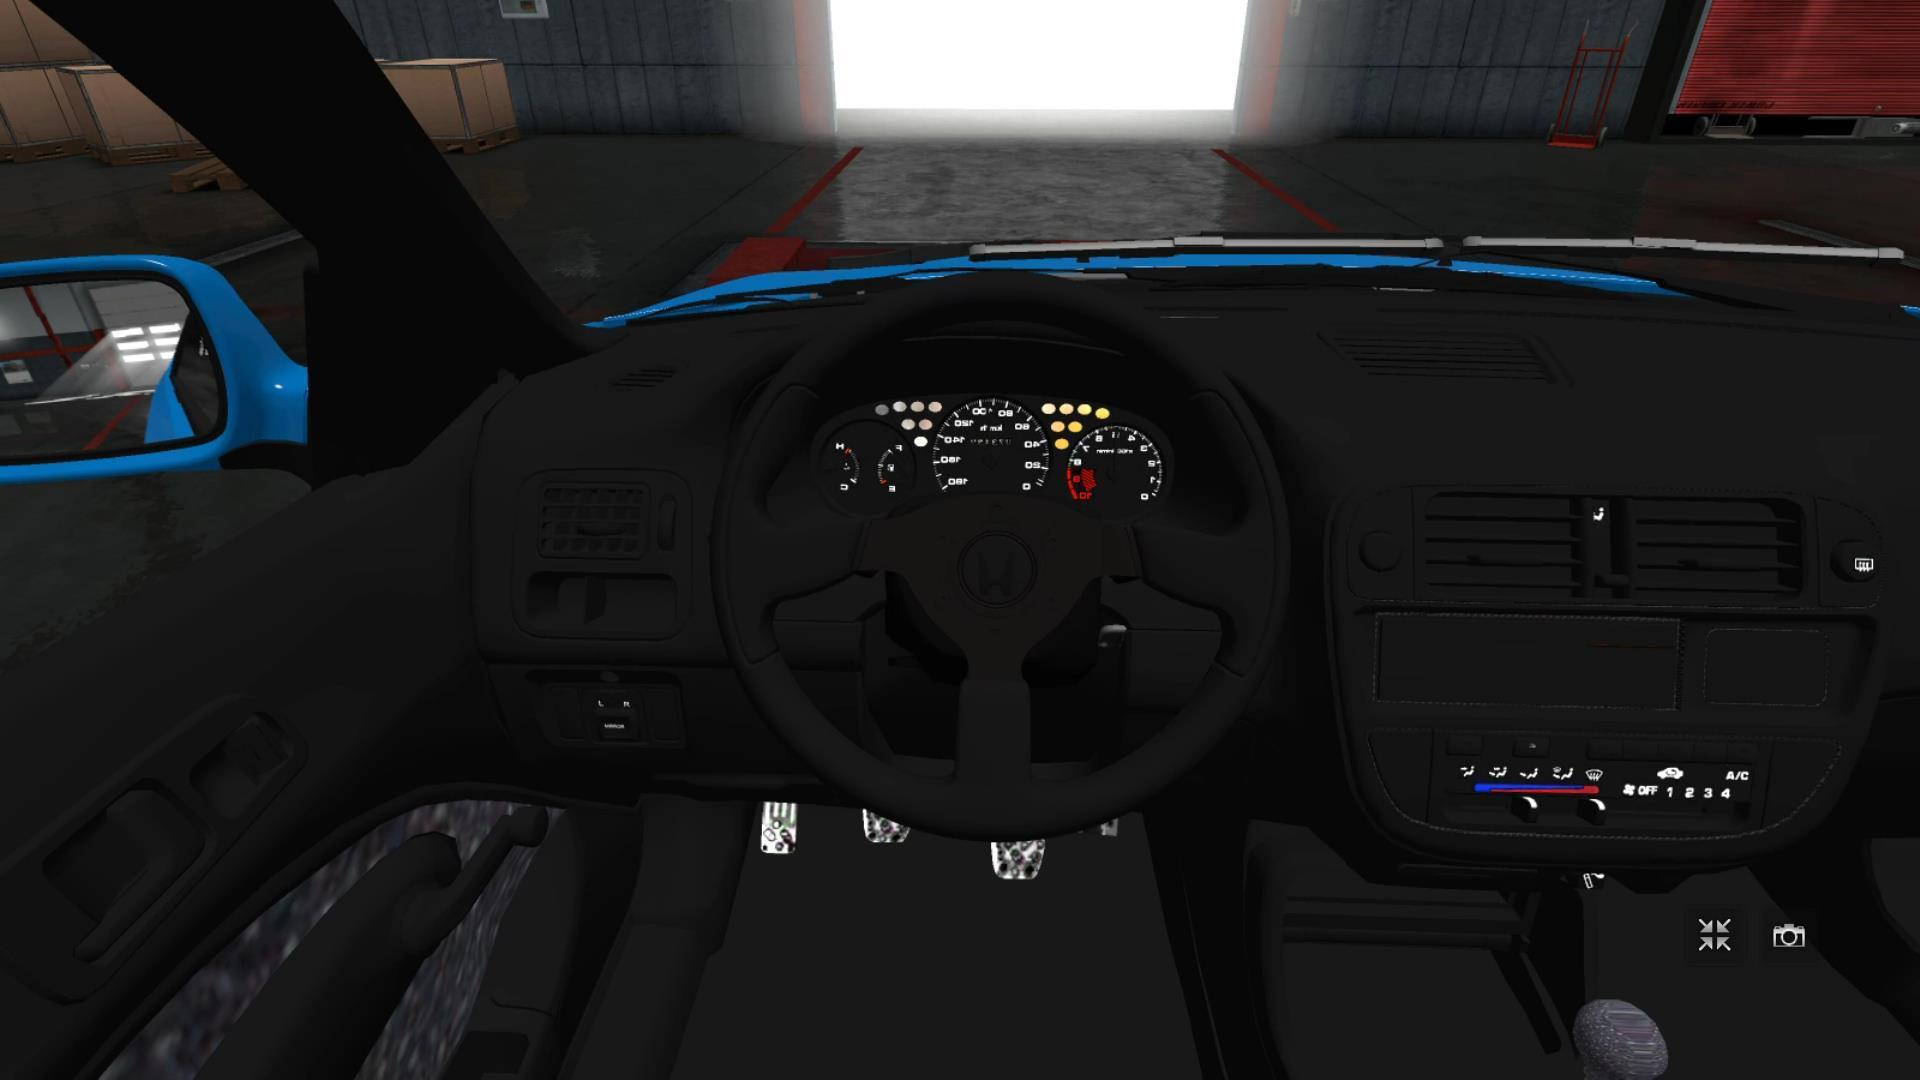 Honda Civic Ek Hatchback >> HONDA CIVIC EK9 HATCHBACK CAR MOD -Euro Truck Simulator 2 Mods